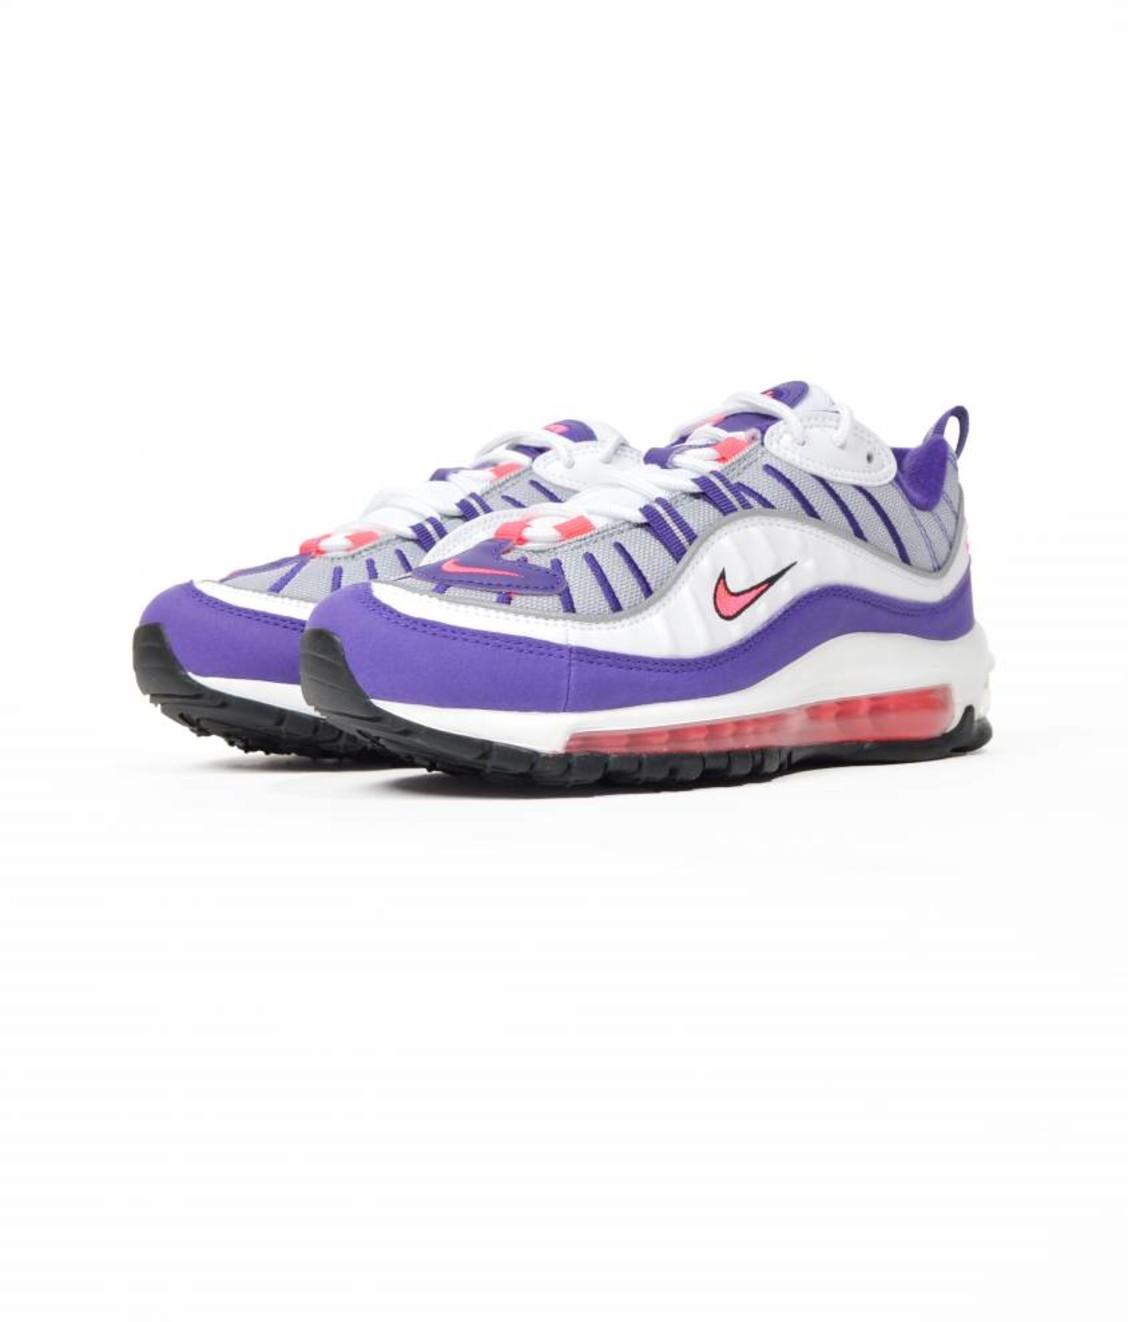 Nike Nike Air Max 98 W White Racer Pink